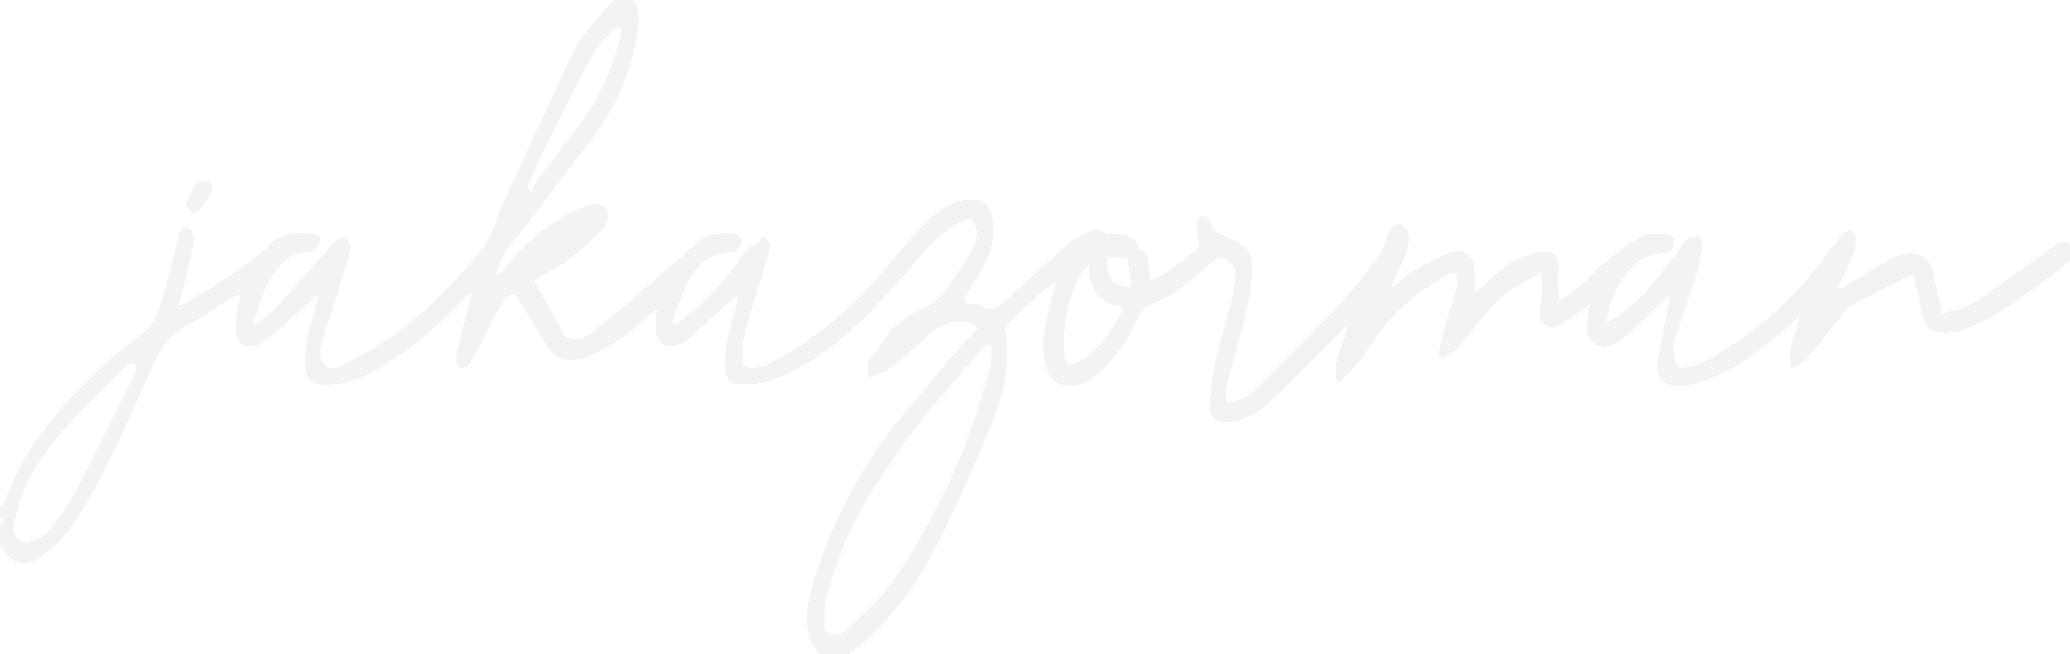 JakaZorman